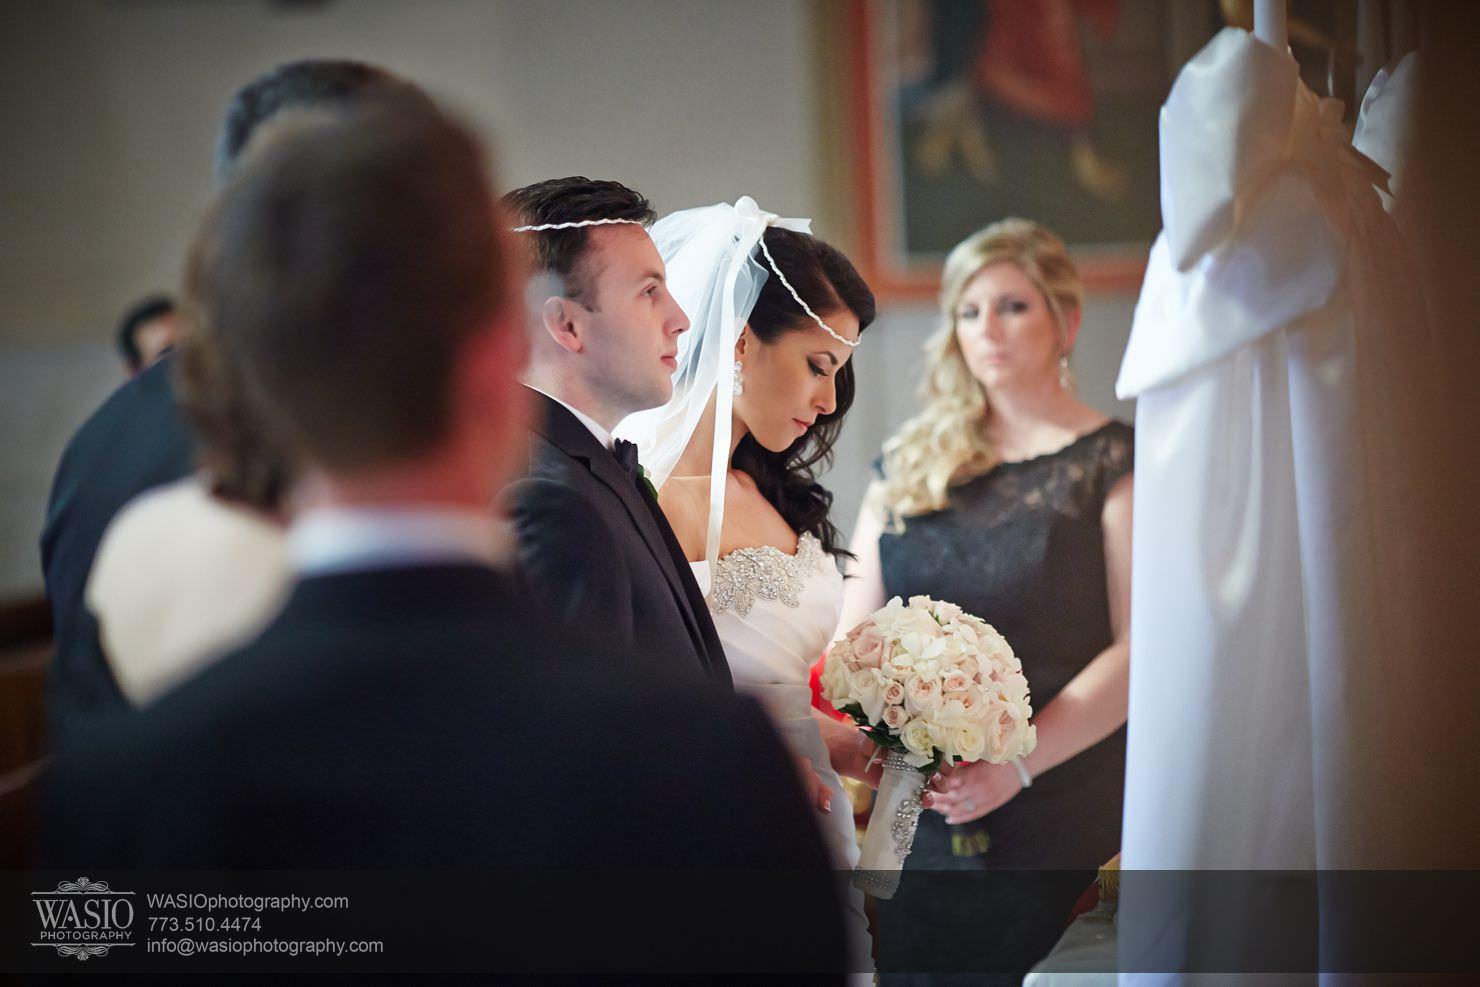 022_Chicago-Spring-Wedding_Chrissy-Andrew_3P4C5626 Chicago Spring Wedding - Chrissy + Andrew